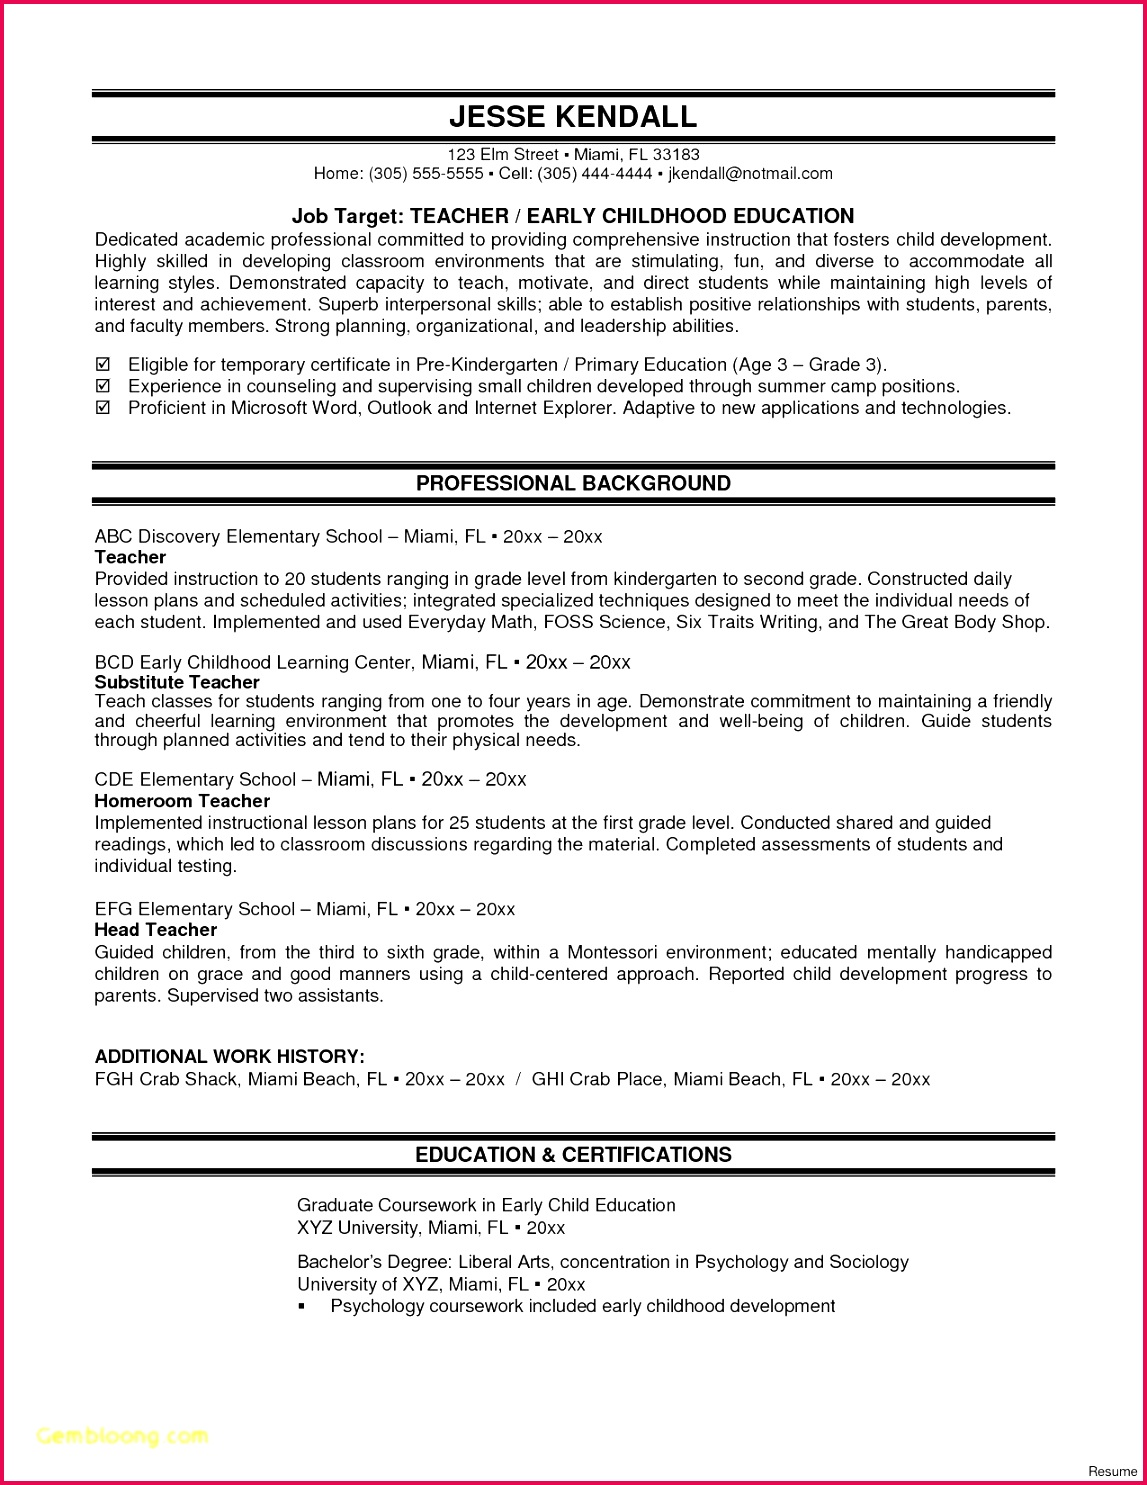 certificate of career letter new sample resume for teacher fresh graduate new awesome cover letter of certificate of career letter